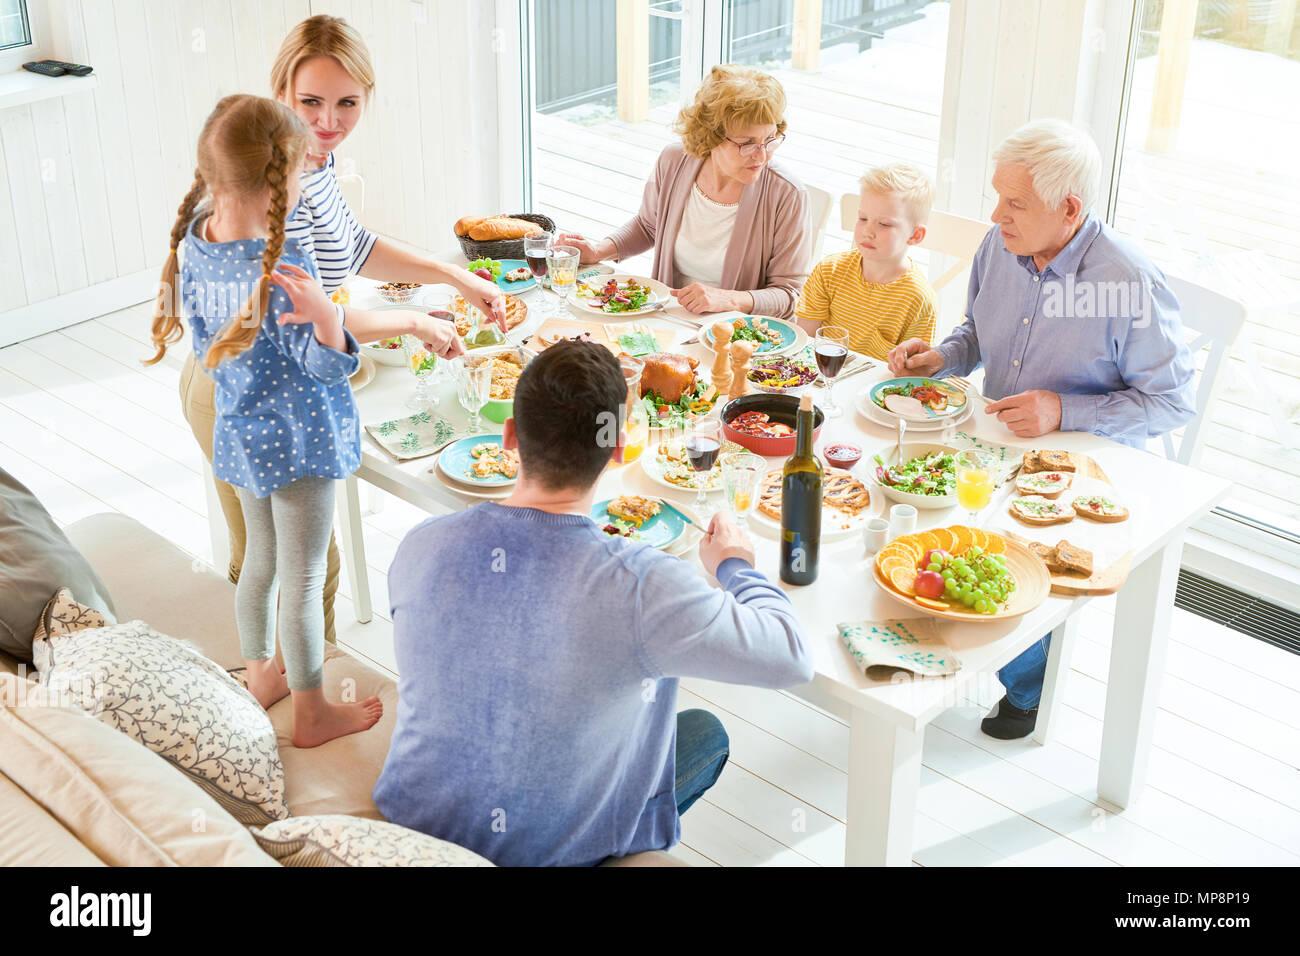 Happy Family Gathering in Sunlight - Stock Image